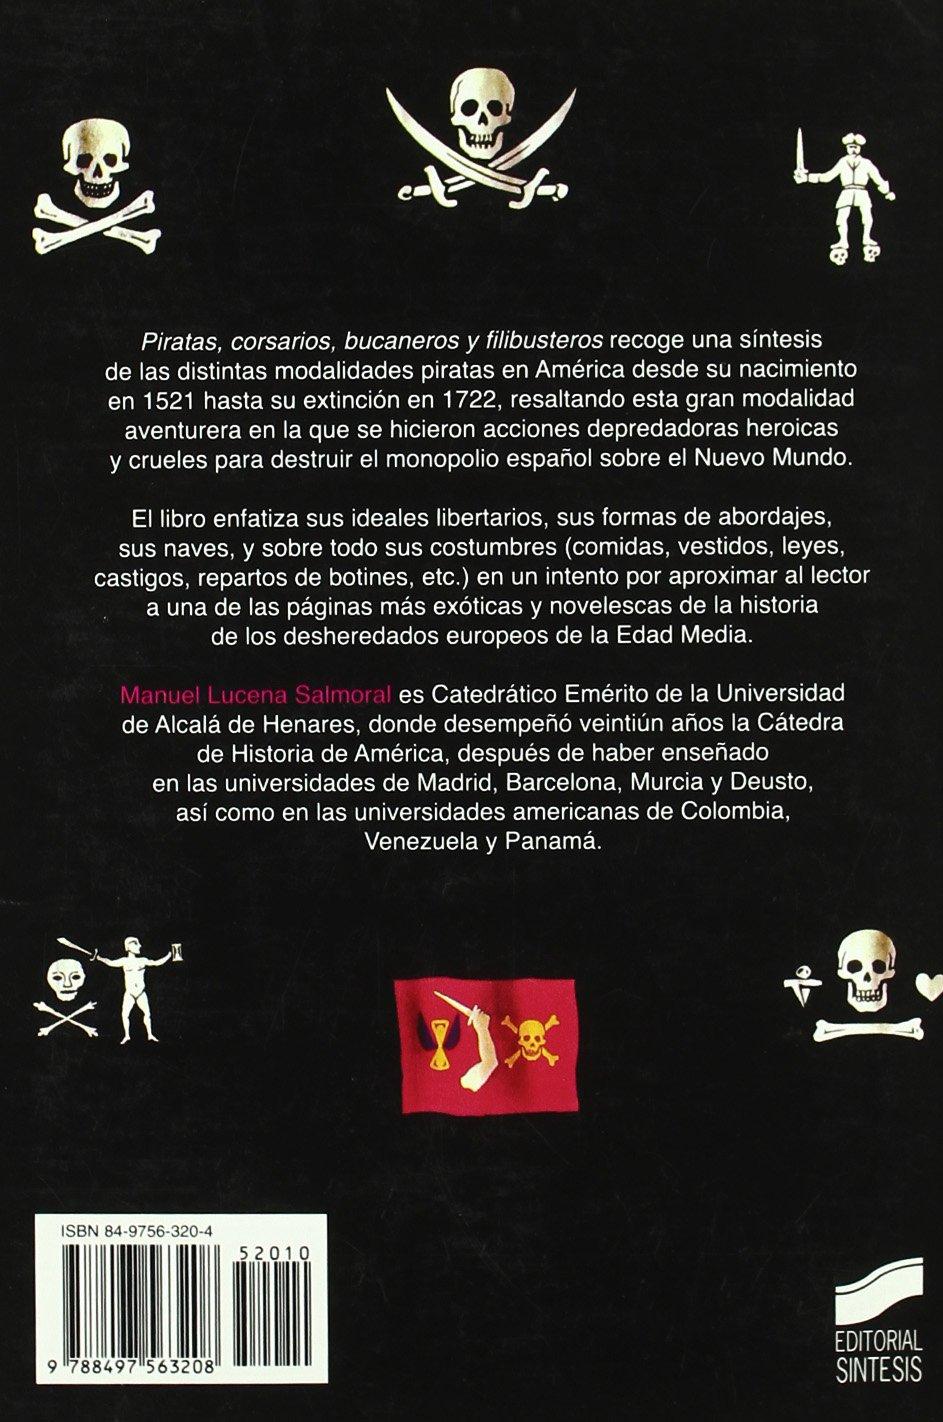 Piratas, Corsarios, Bucaneros y Filibusteros (Spanish Edition): Manuel Lucena Salmoral: 9788497563208: Amazon.com: Books